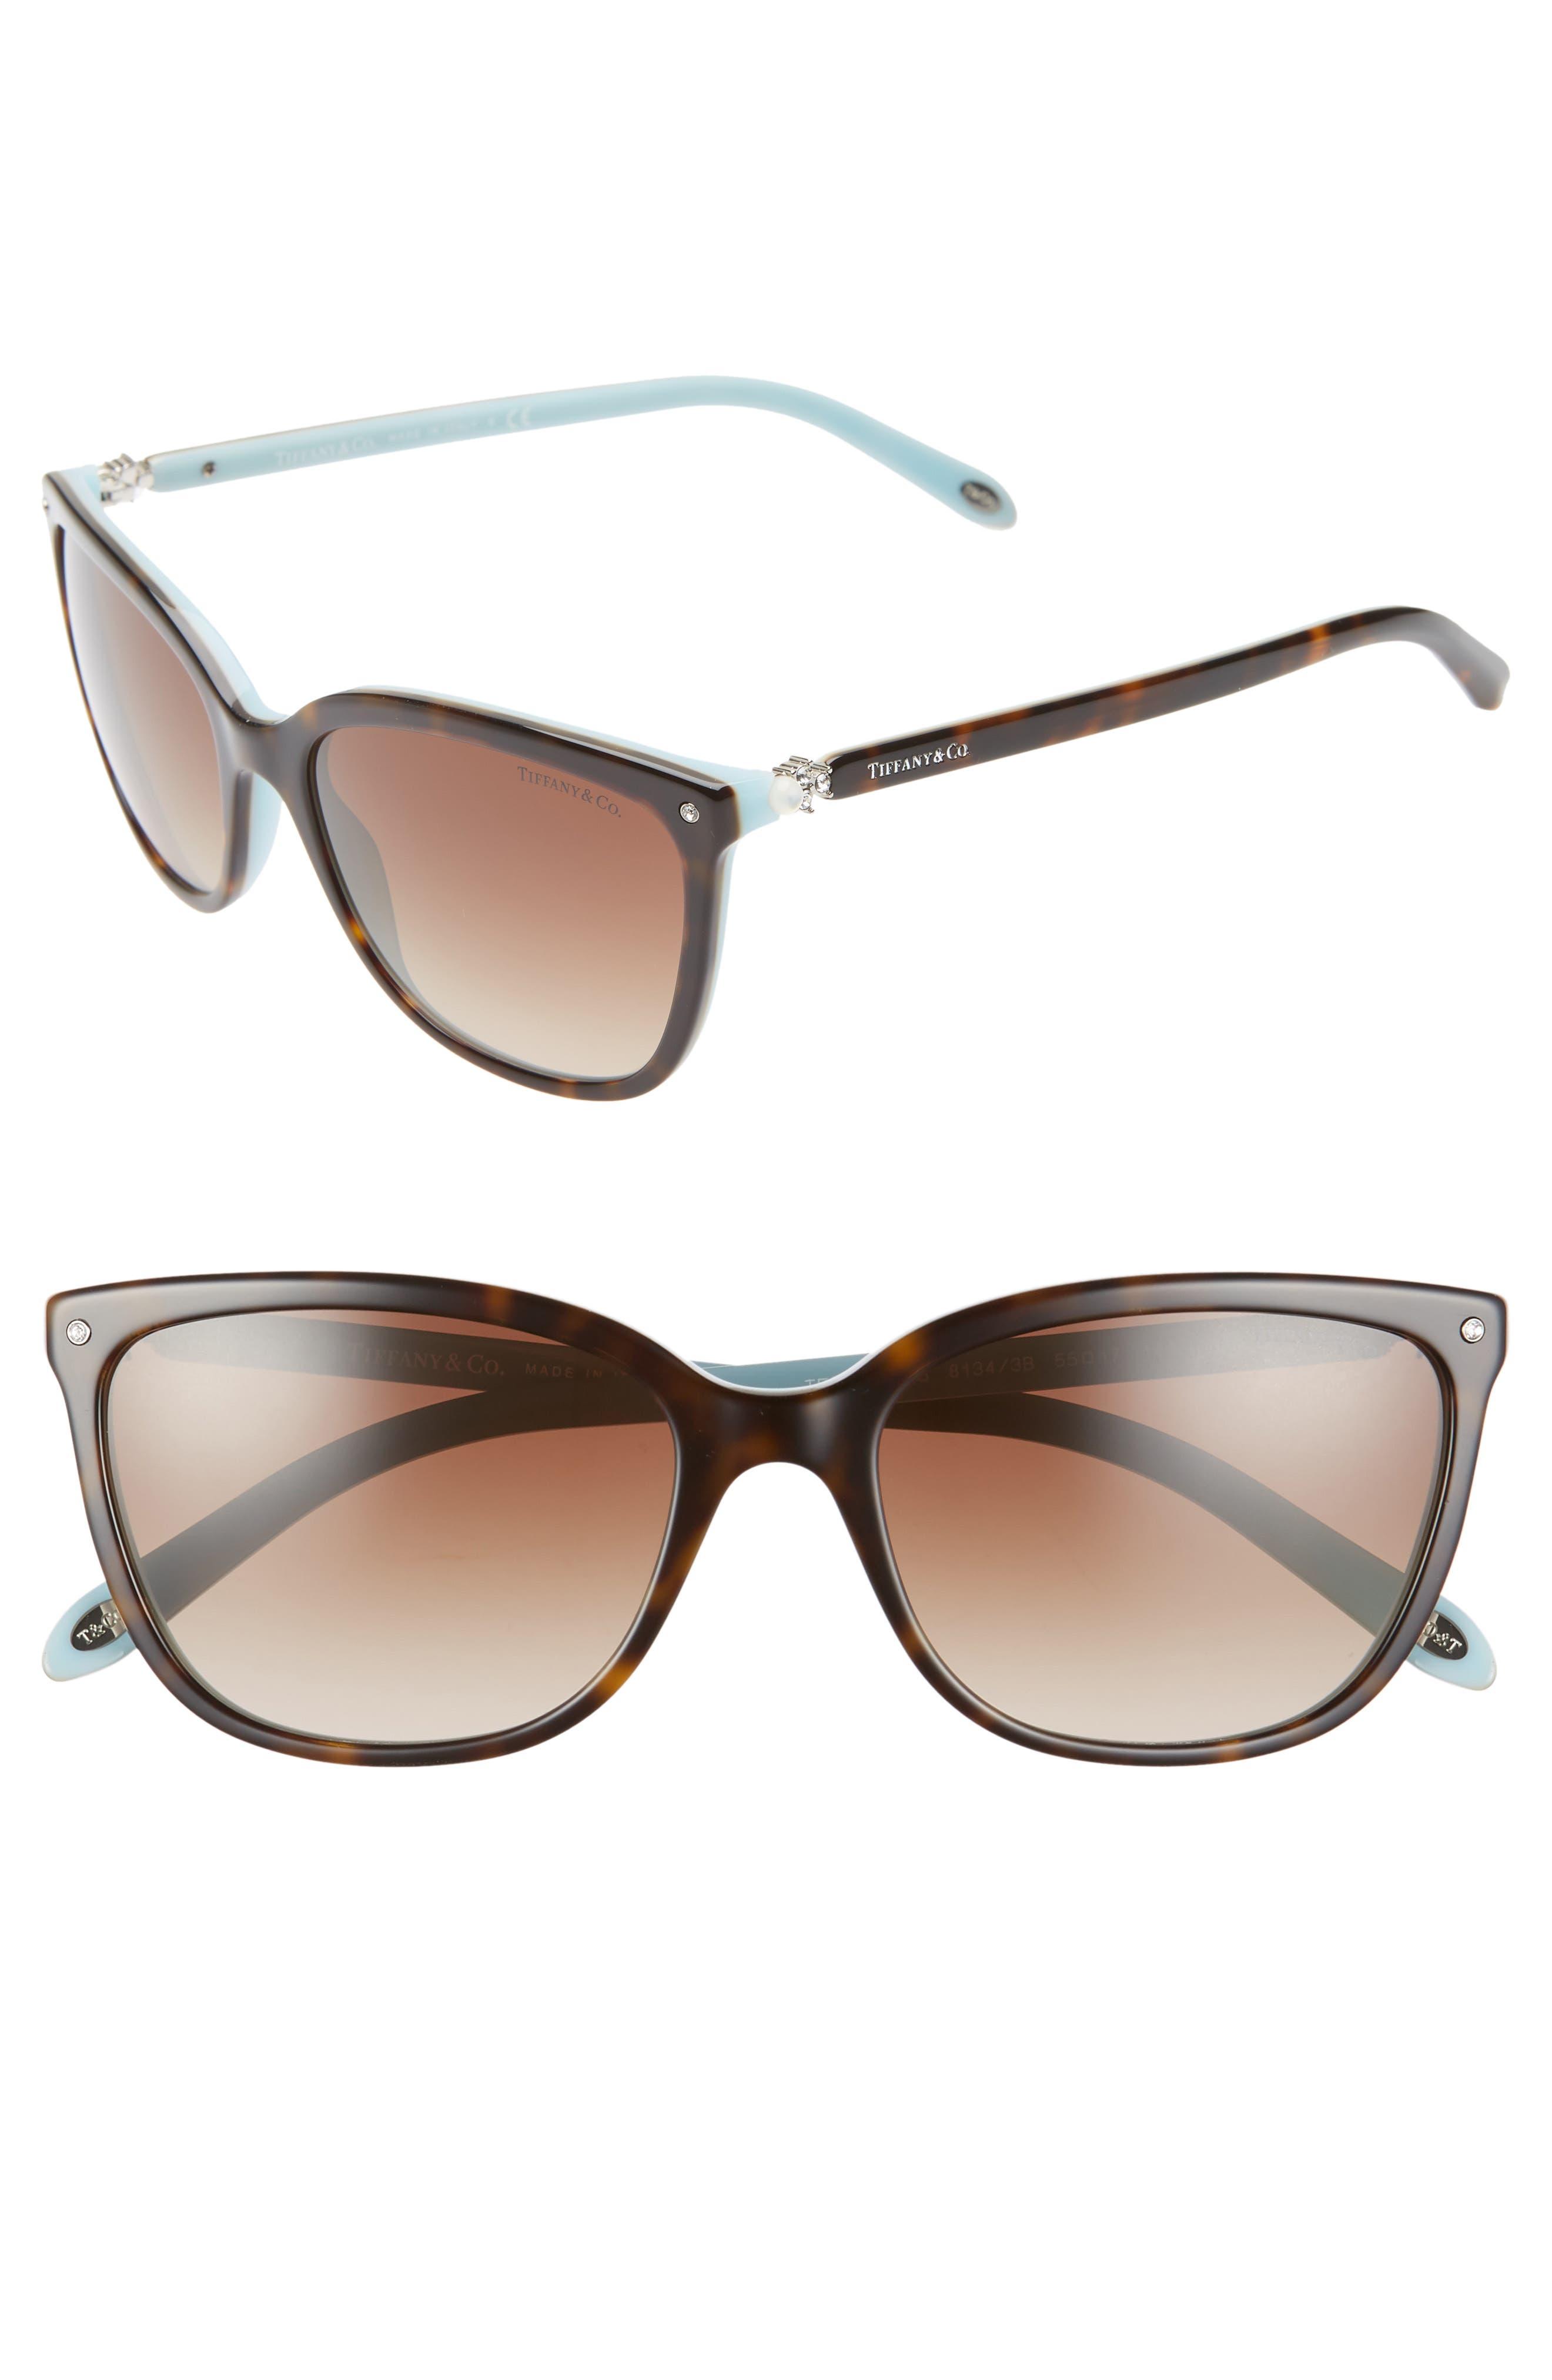 366ea8a378f Tiffany   Co. Sunglasses for Women